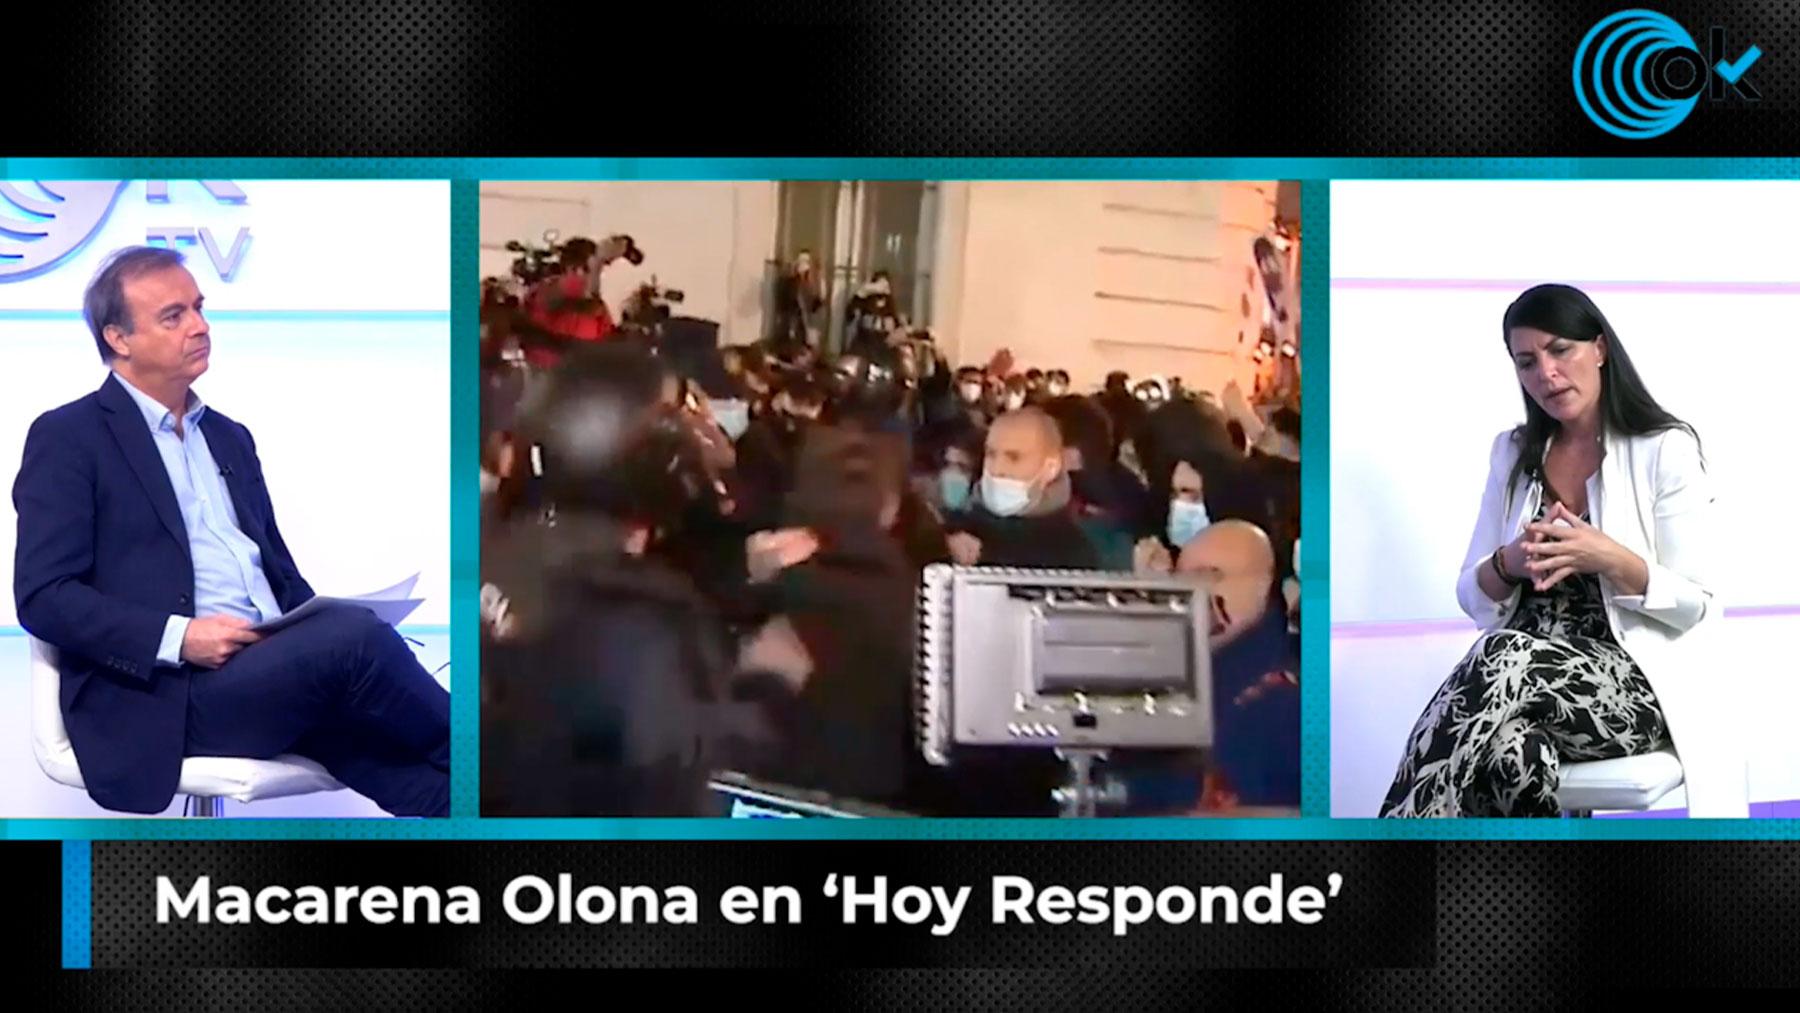 Macarena Olona en Hoy Responde